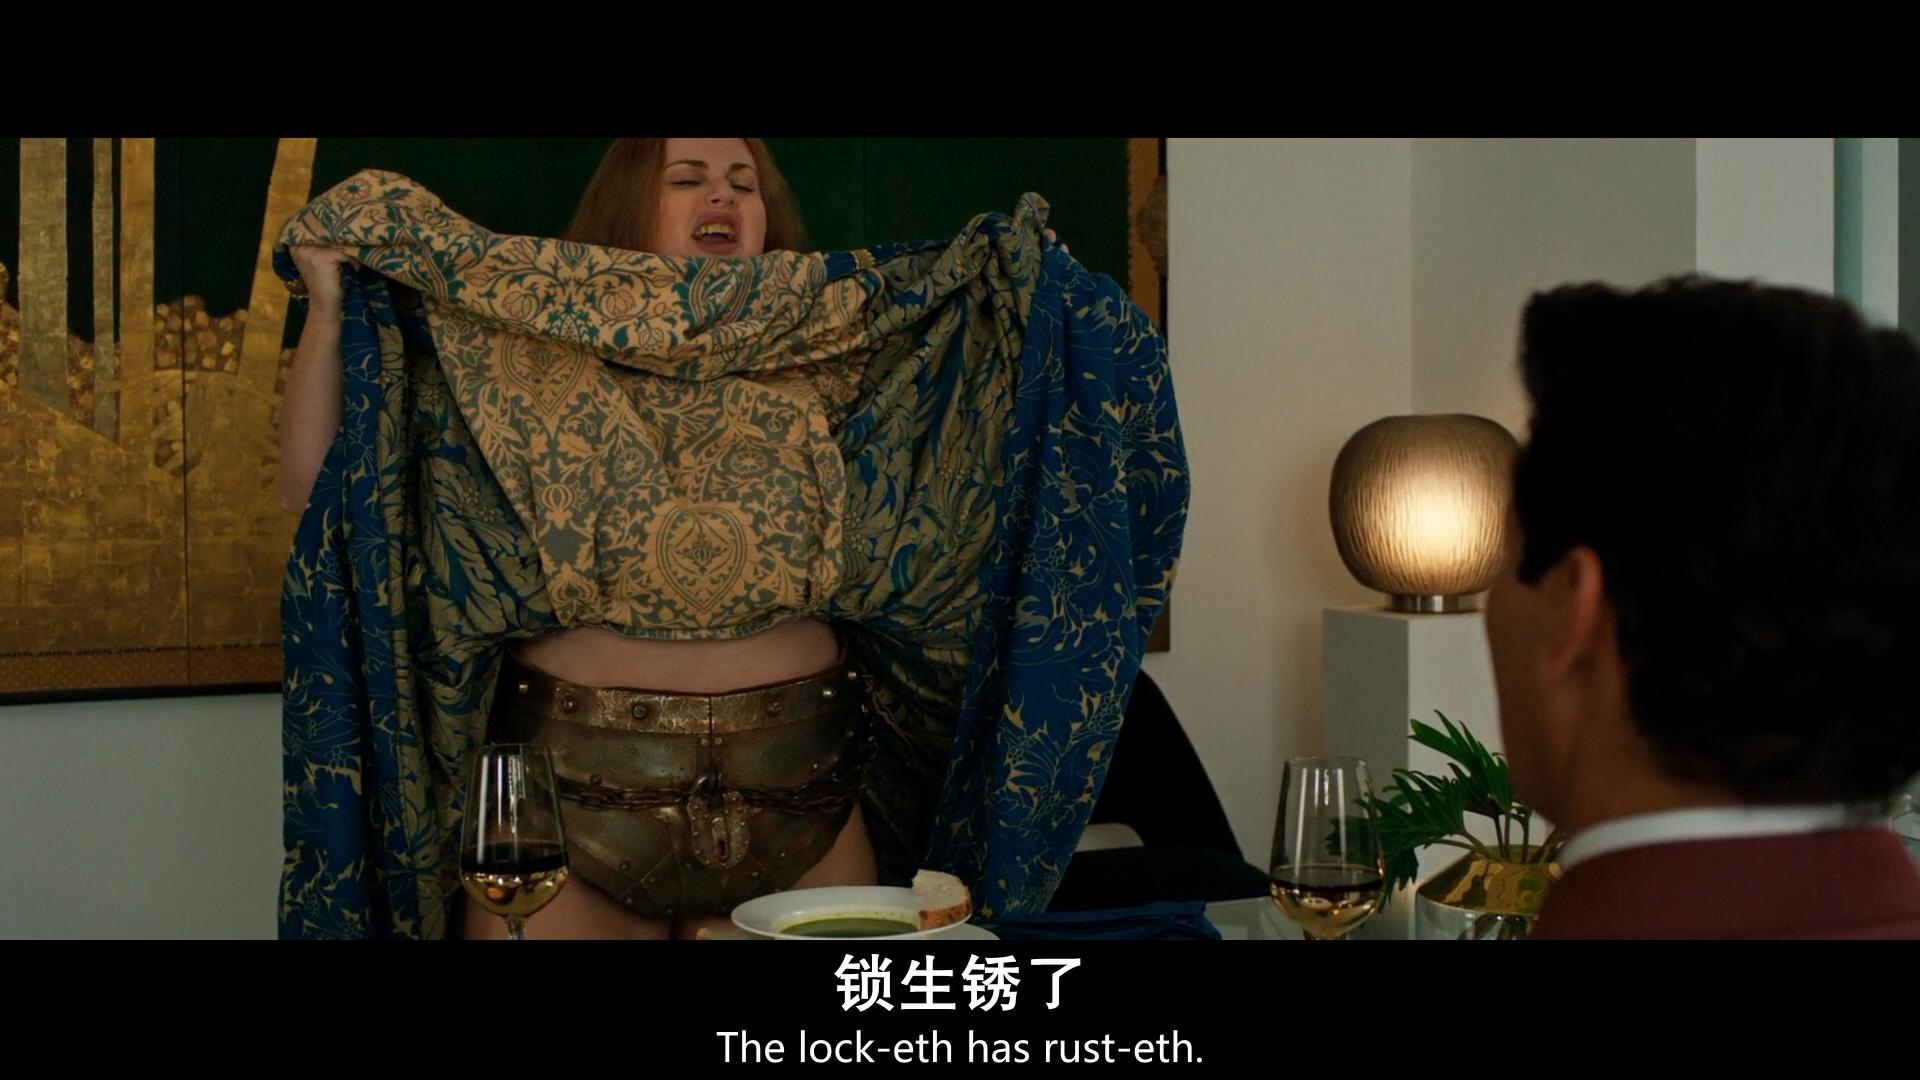 偷心女盗 The Hustle (2019) 1080P